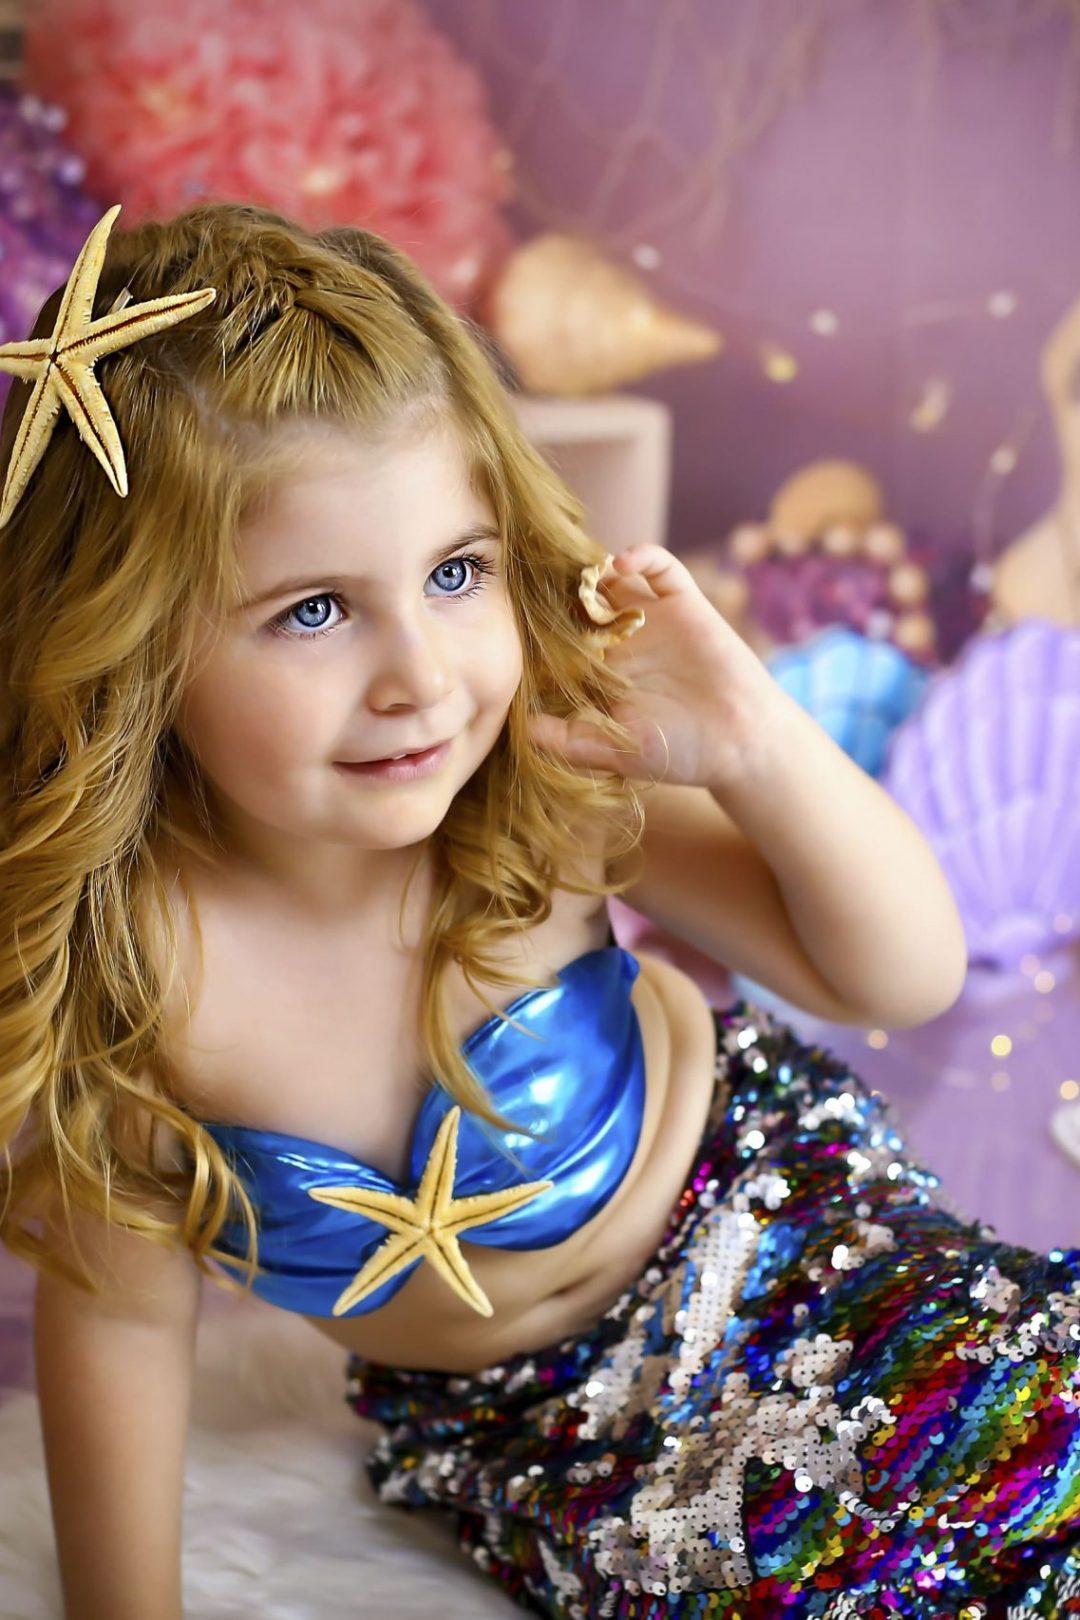 3-4-5-6-yas-bebek-fotograf-cekimi-3-4-5-6-yas-cocuk-konsept-cekim-ankara-bebek-fotografcisi-fotografci-kiz-ankara (20)